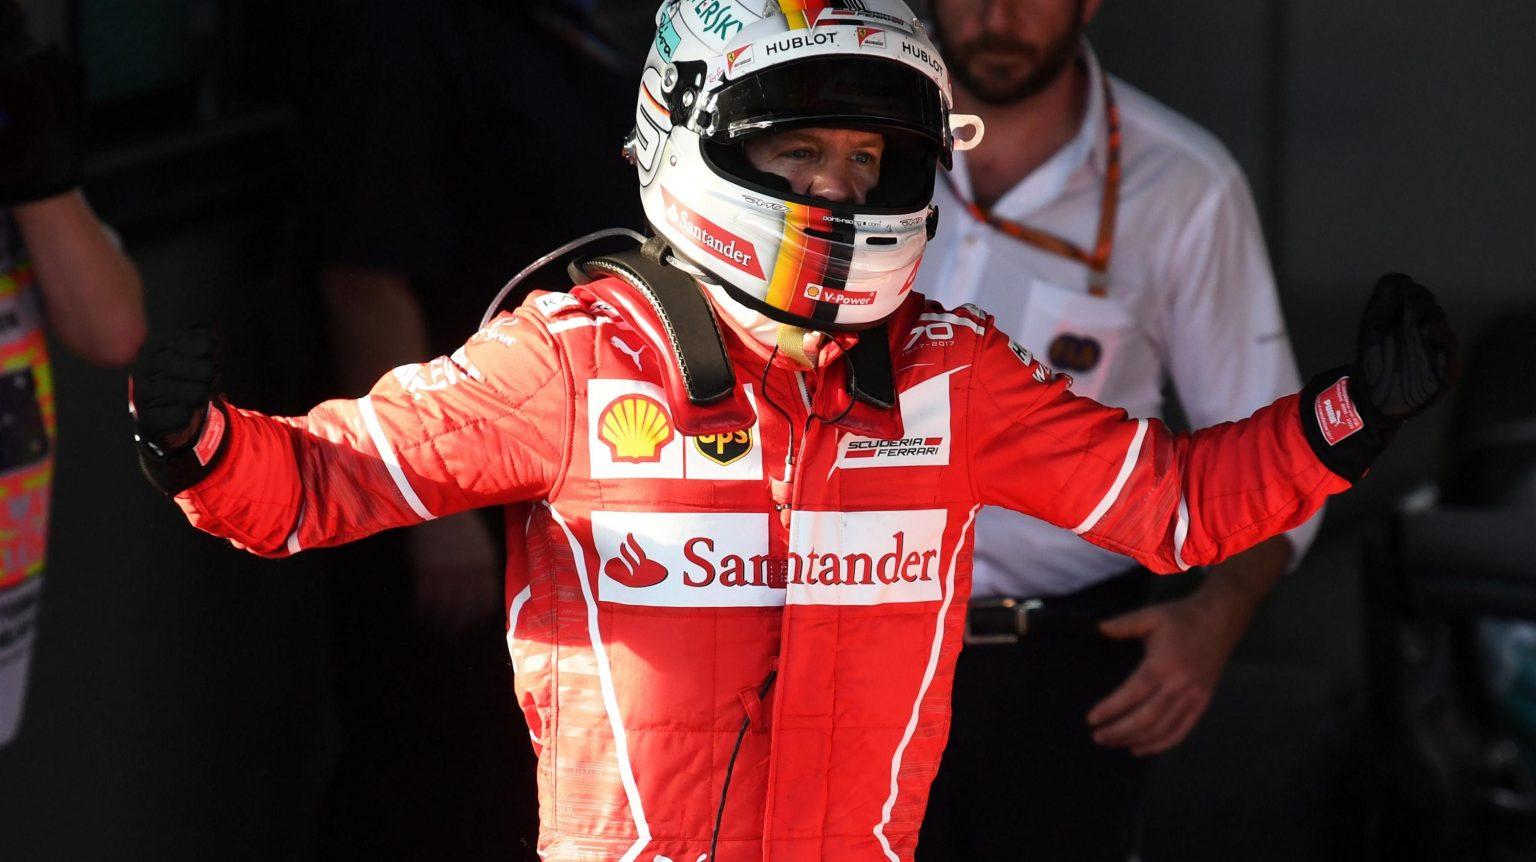 [Fórmula 1] Sebastian Vettel y Ferrari triunfadores en Australia